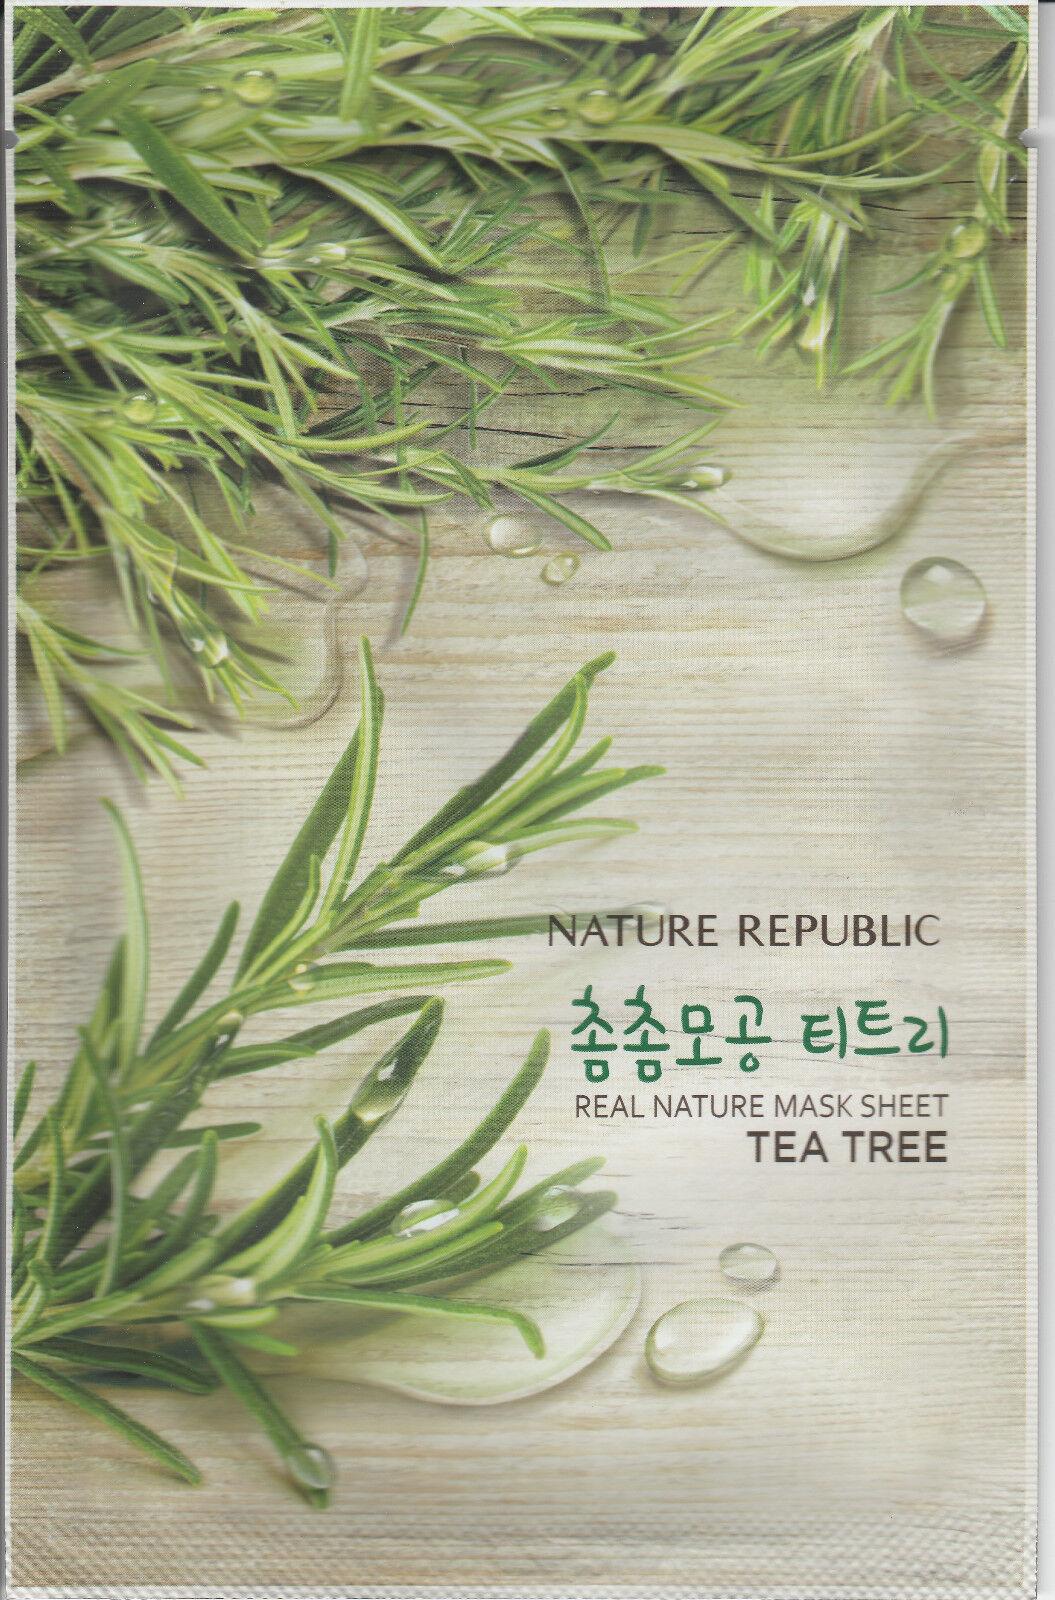 Nature Republic Korean Beauty Sheet Face Mask Set 5x Natural